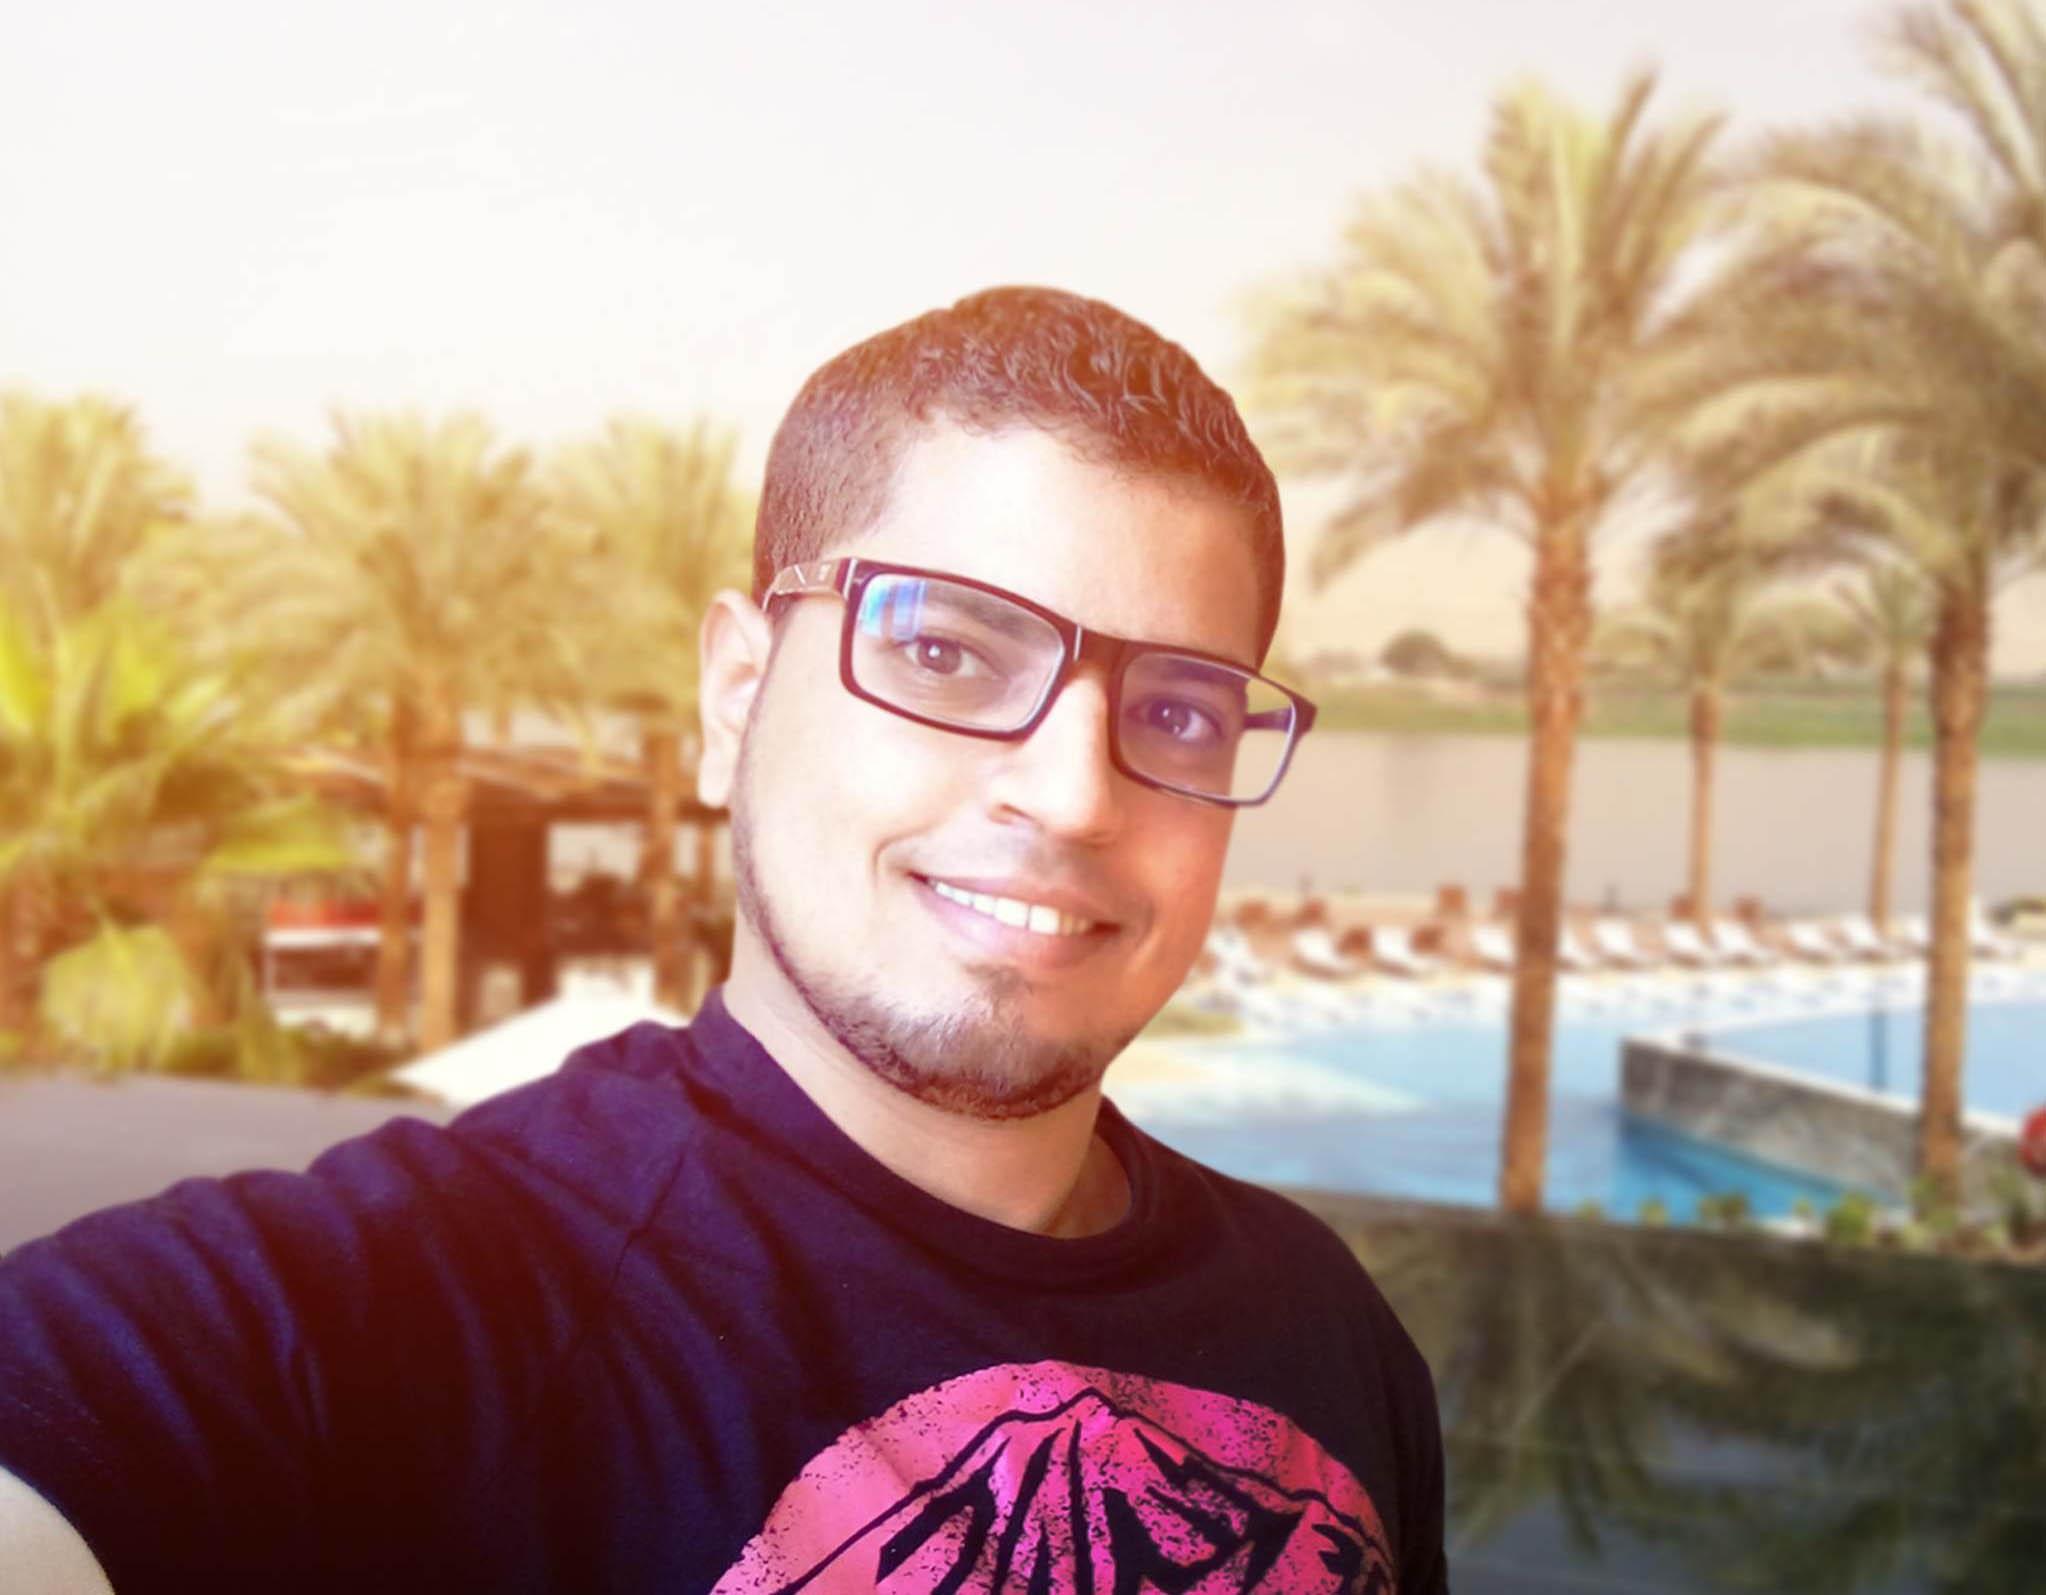 Abdallah Ahmed Oraby